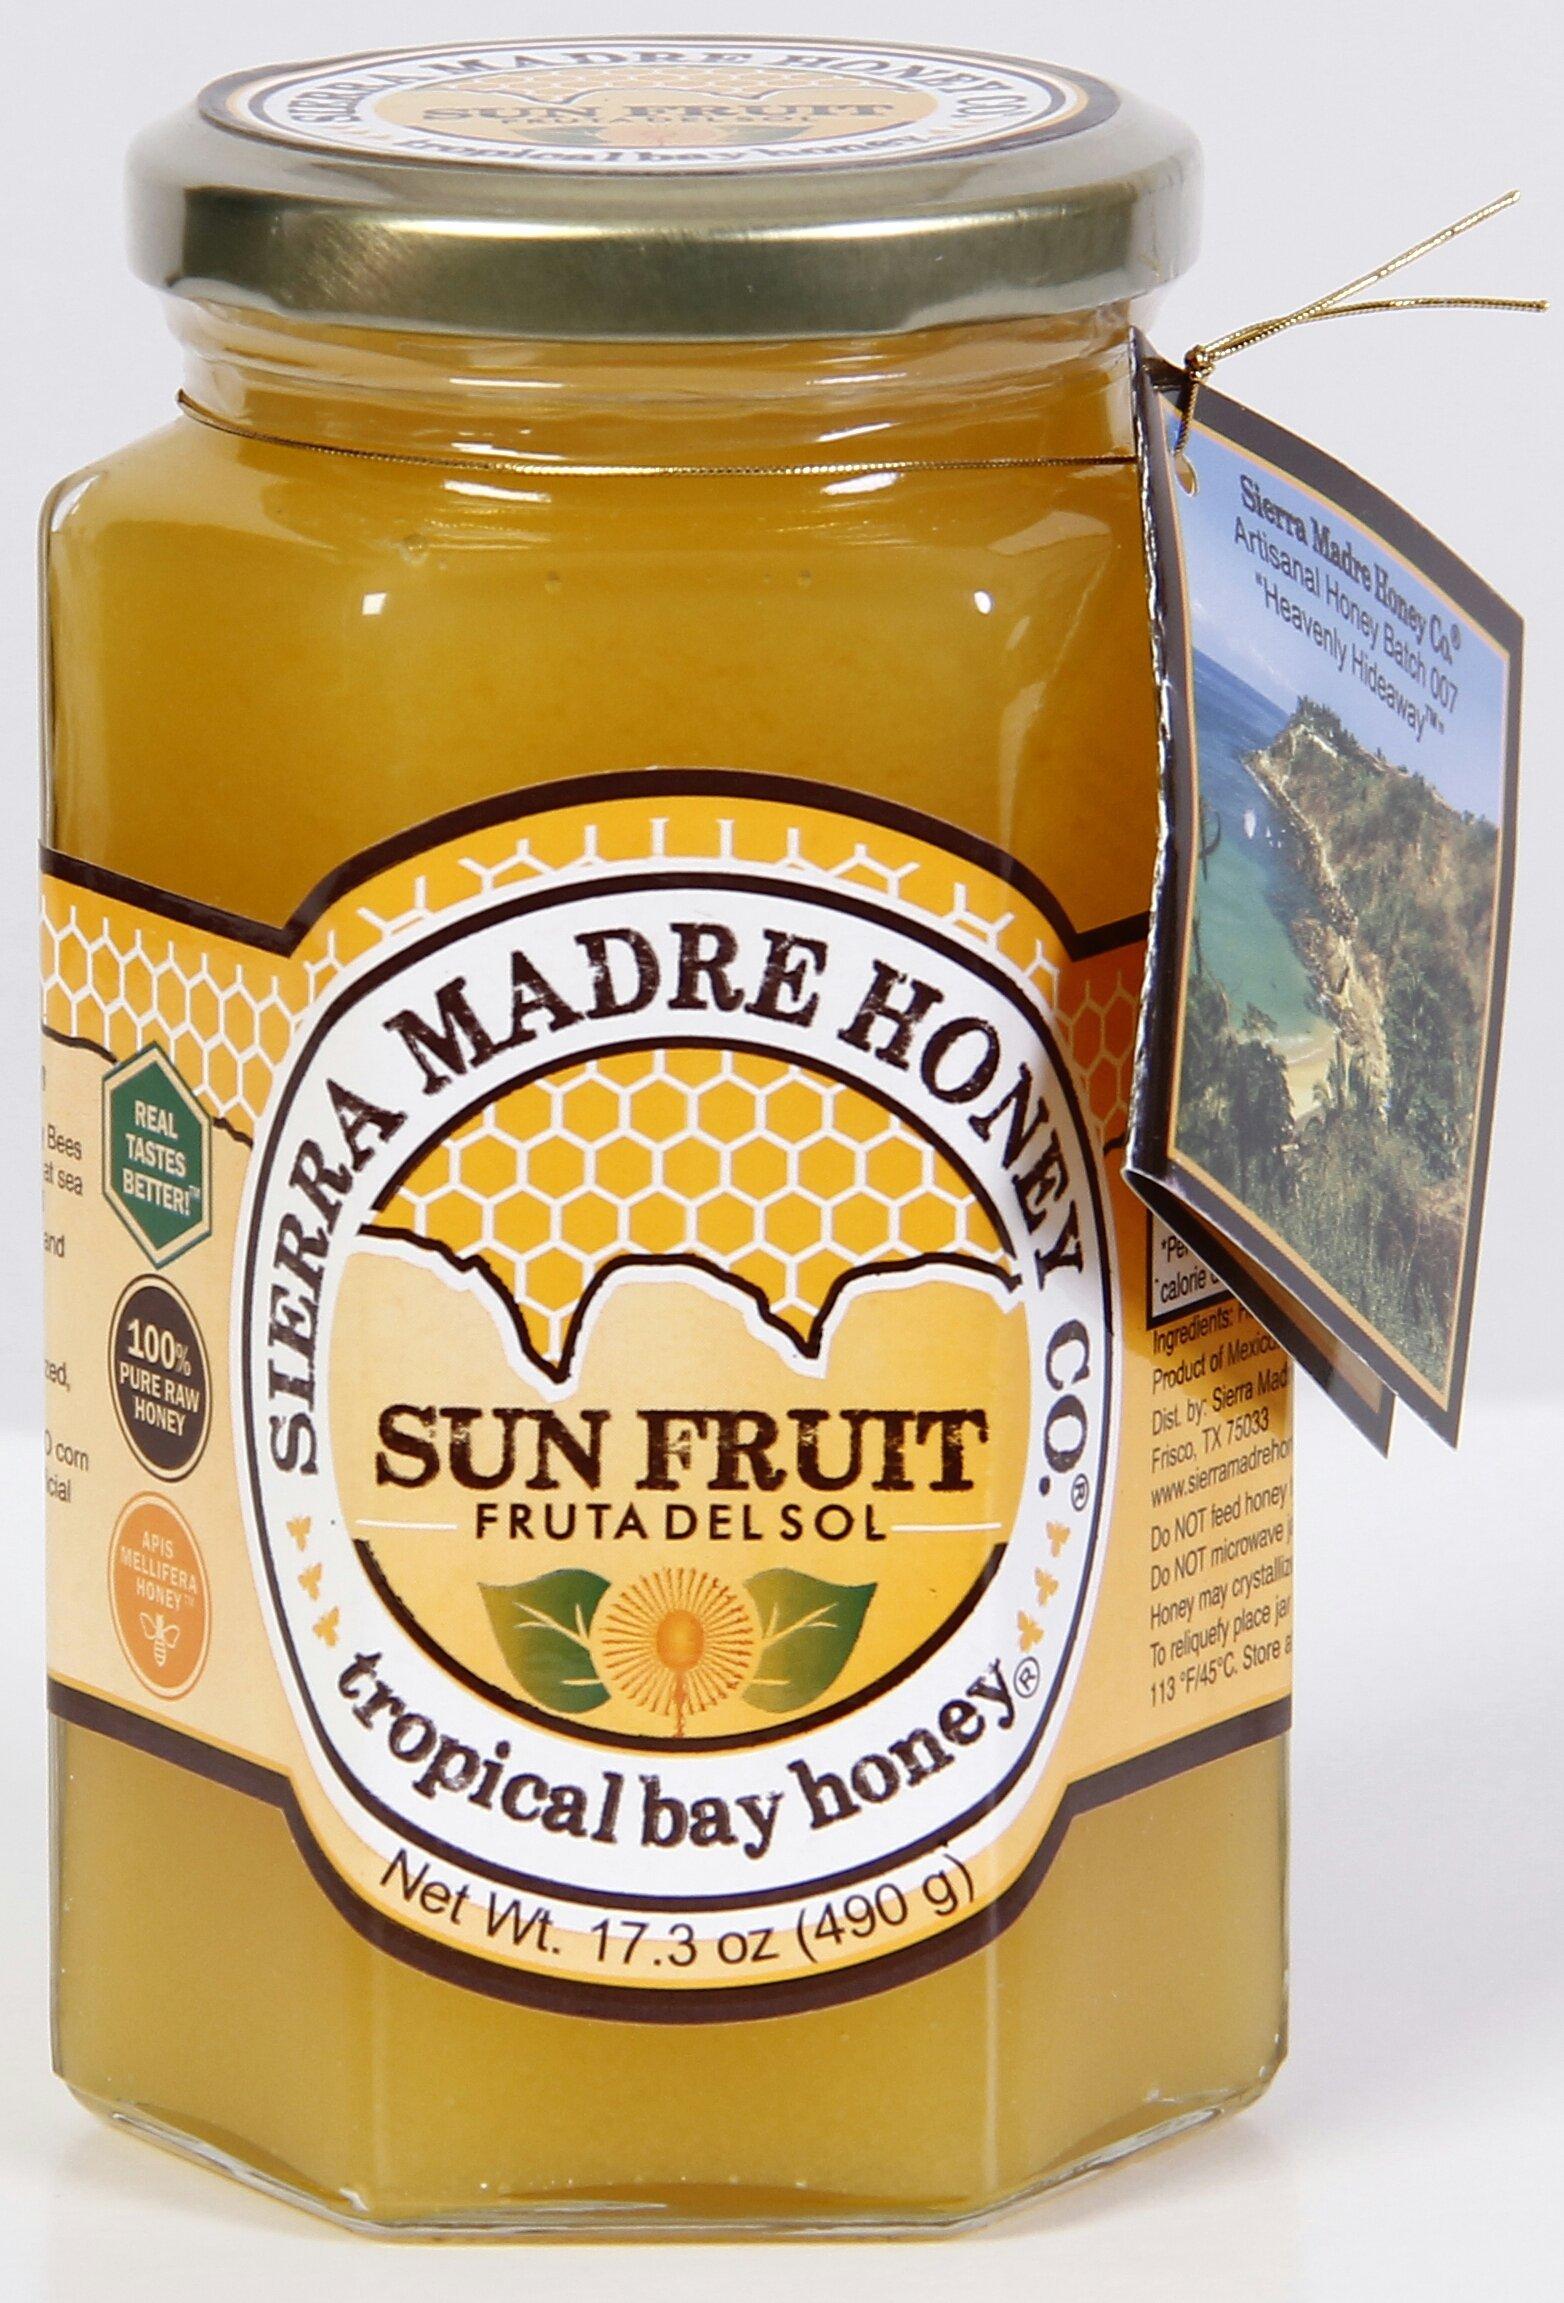 Sun Fruit ''Fruta del Sol'' Tropical Bay Honey 17.3 oz by Sierra Madre Honey Co.